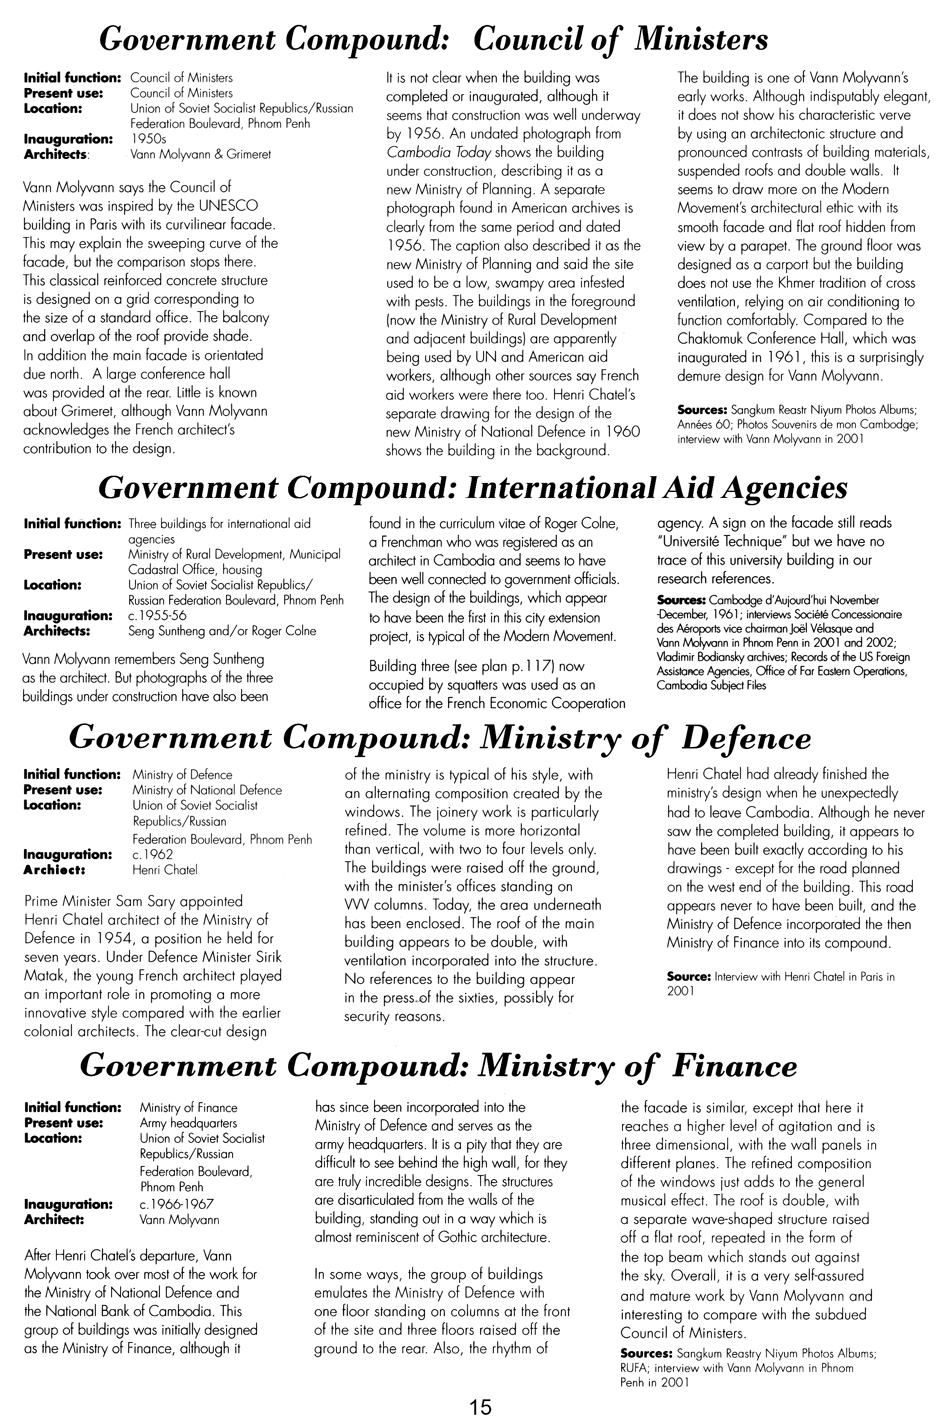 All/document/Documents/BuildingCambodia/BuildingCambodia/id667/photo015.jpg